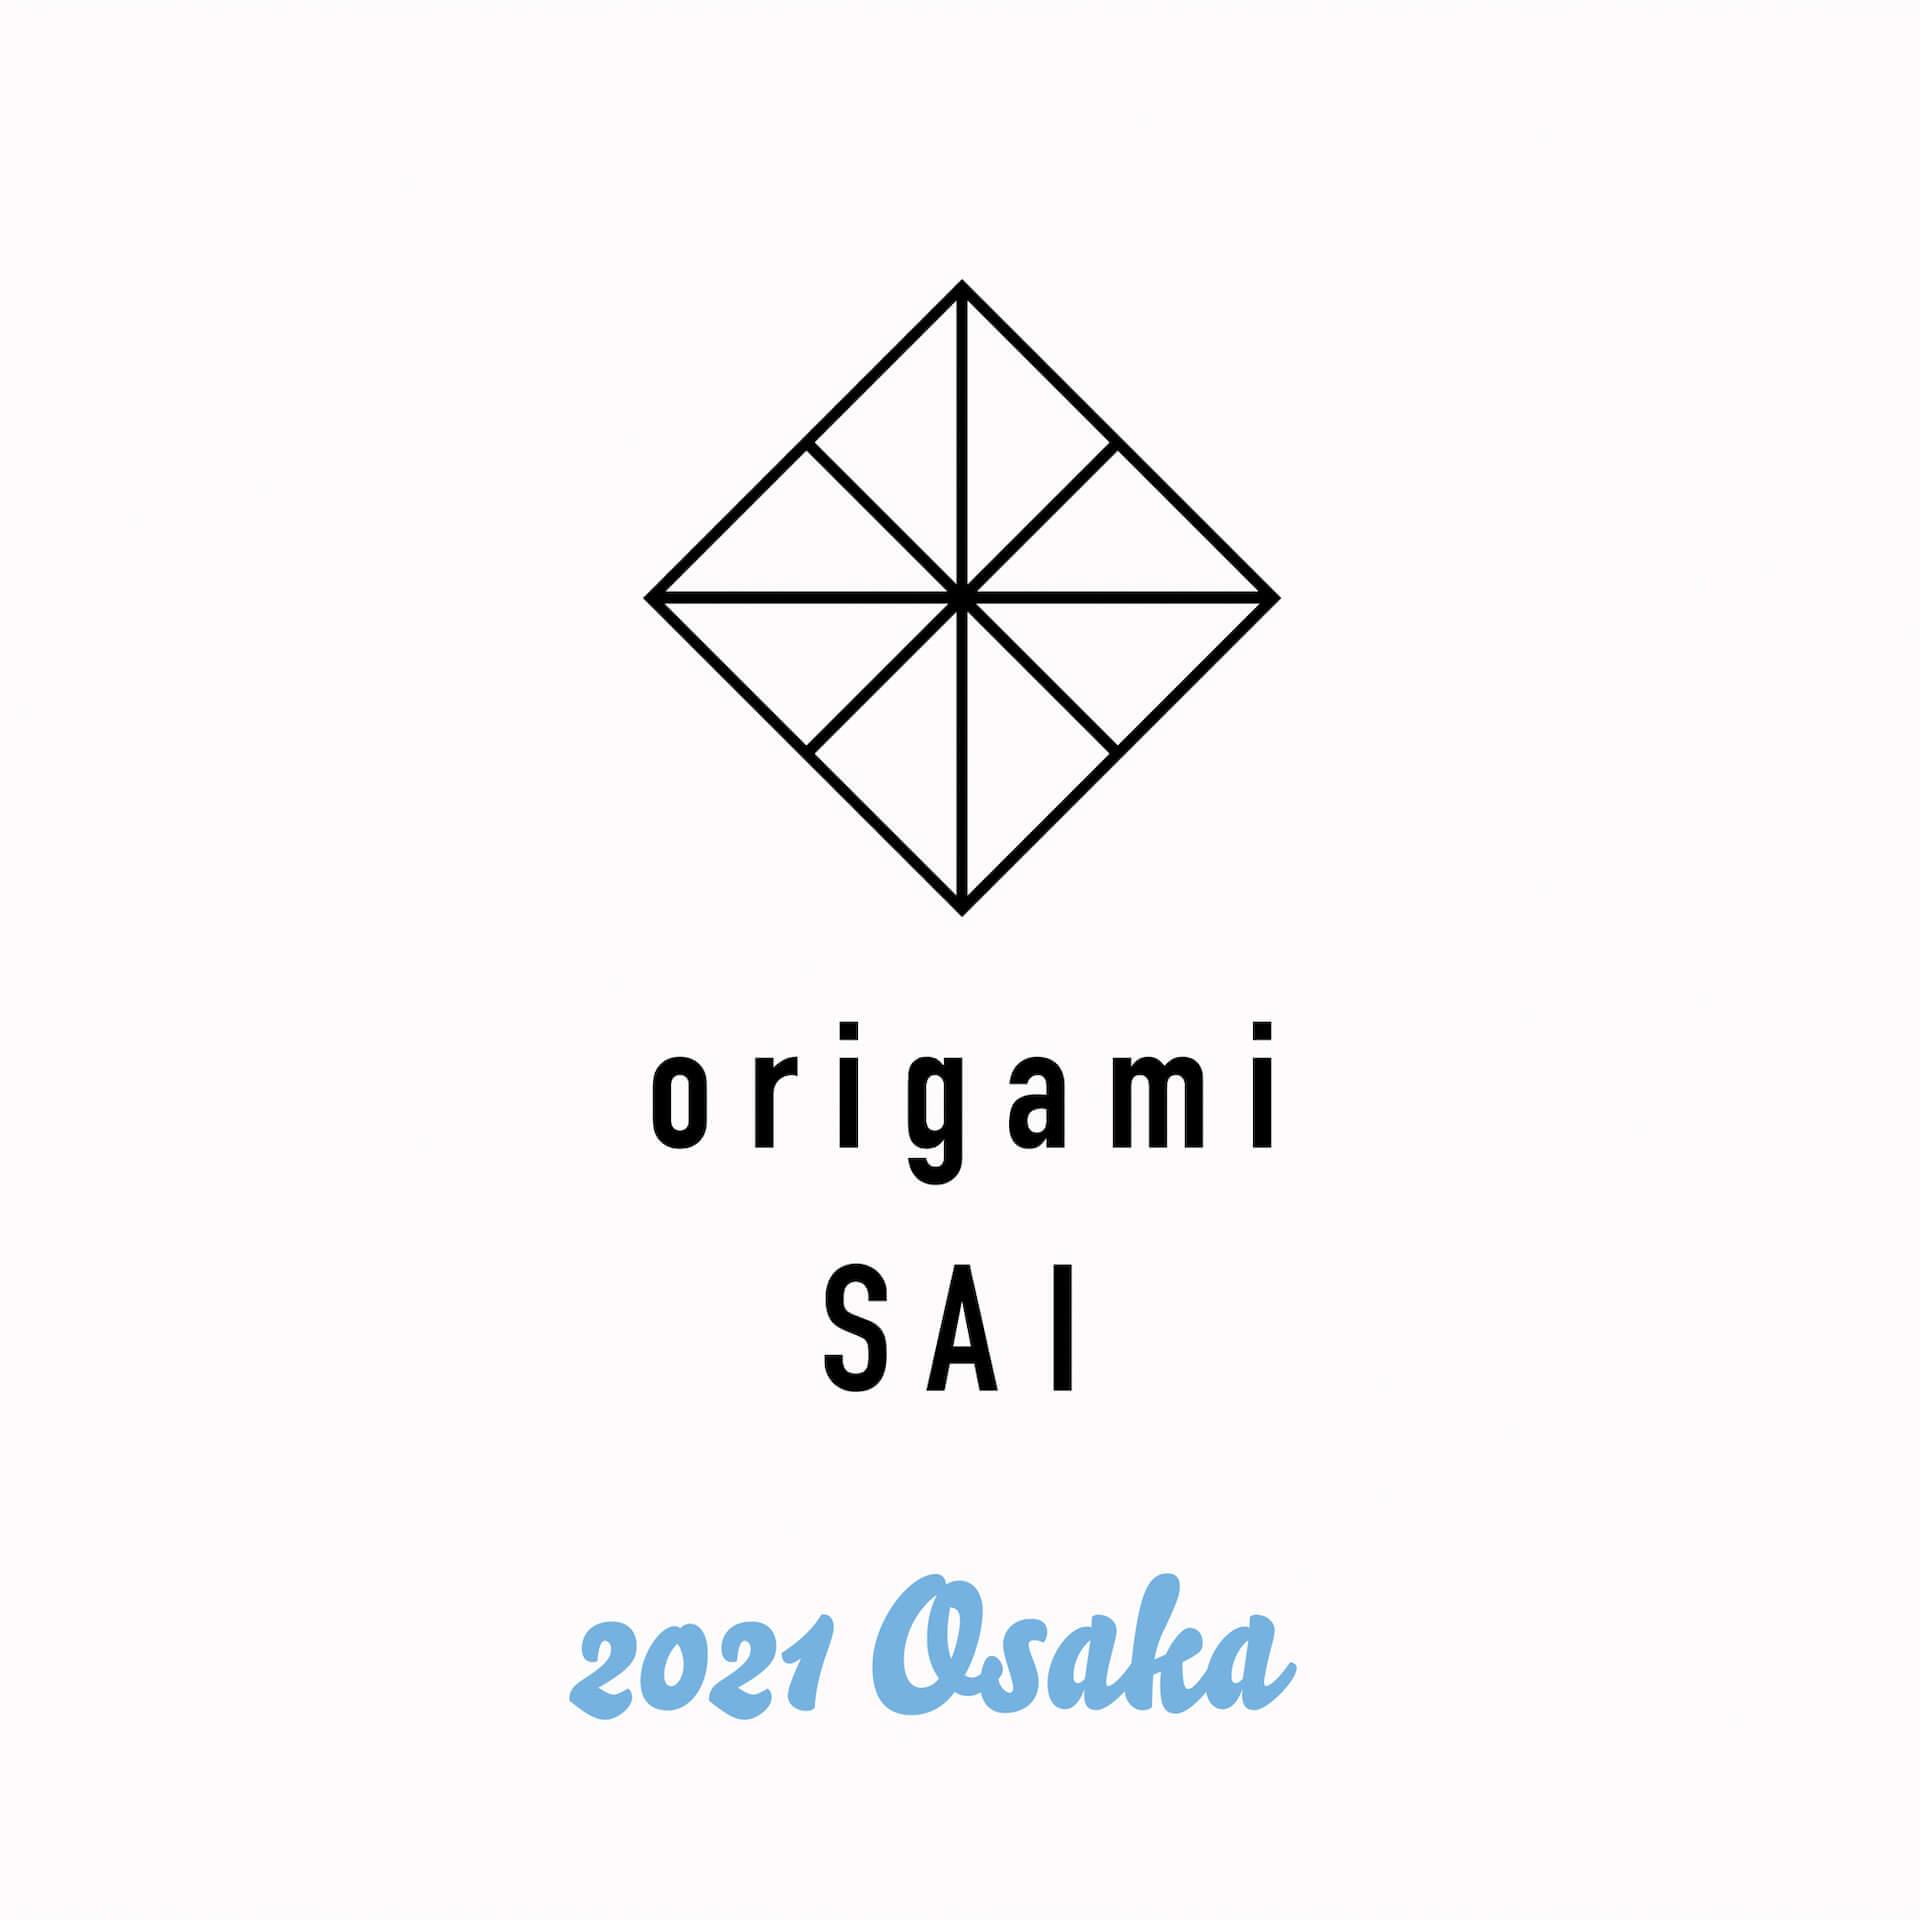 〈origami PRODUCTIONS〉アーティストが一堂に会するイベント<origami SAI 2021 Osaka>大阪で初開催決定! music210422_origamisai-2021-210422-210422_8